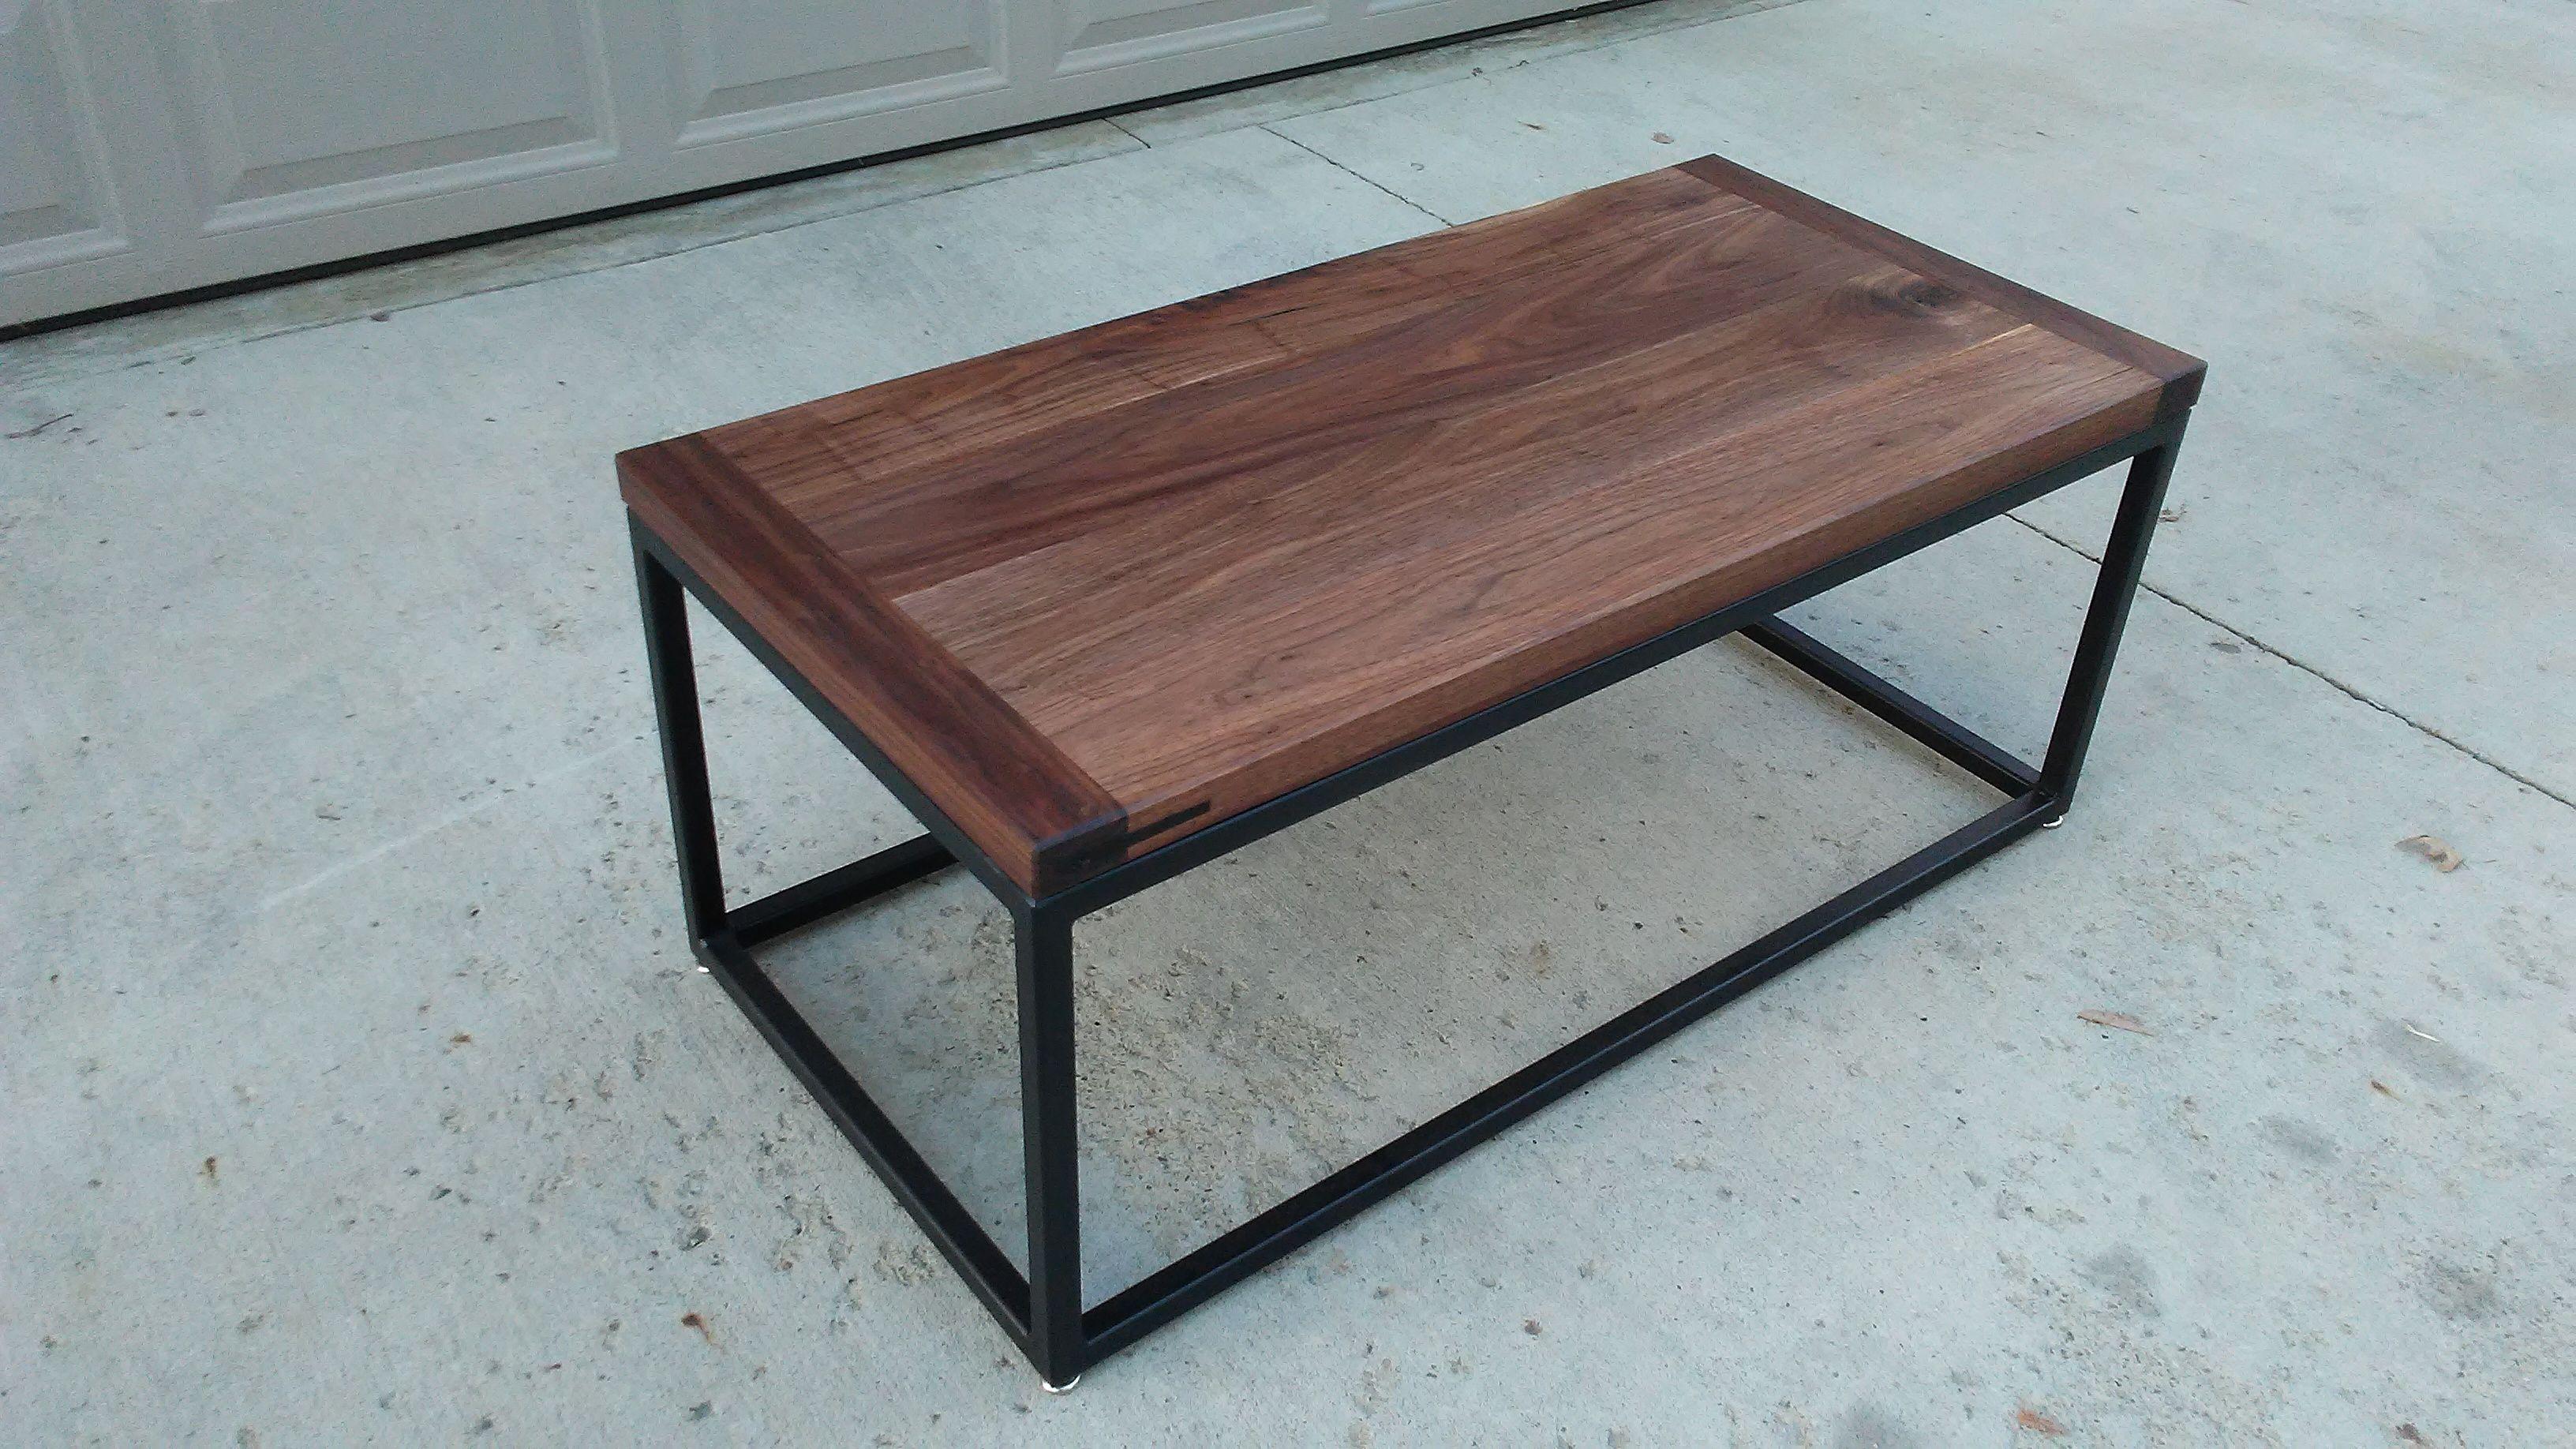 Brent Villella Villella Custom Woodworking